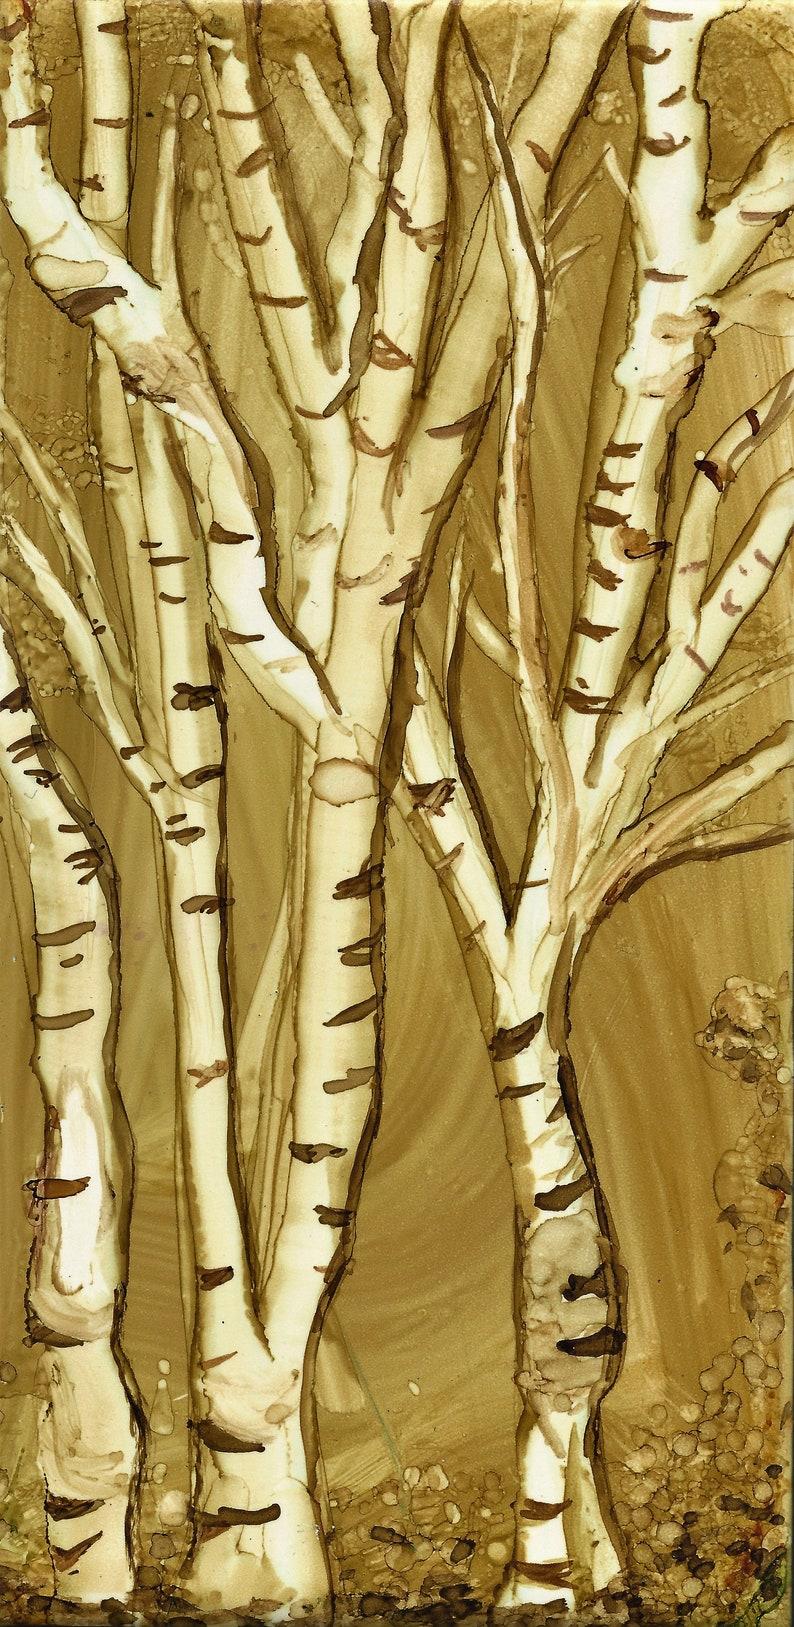 Birch Tree in Winter image 0